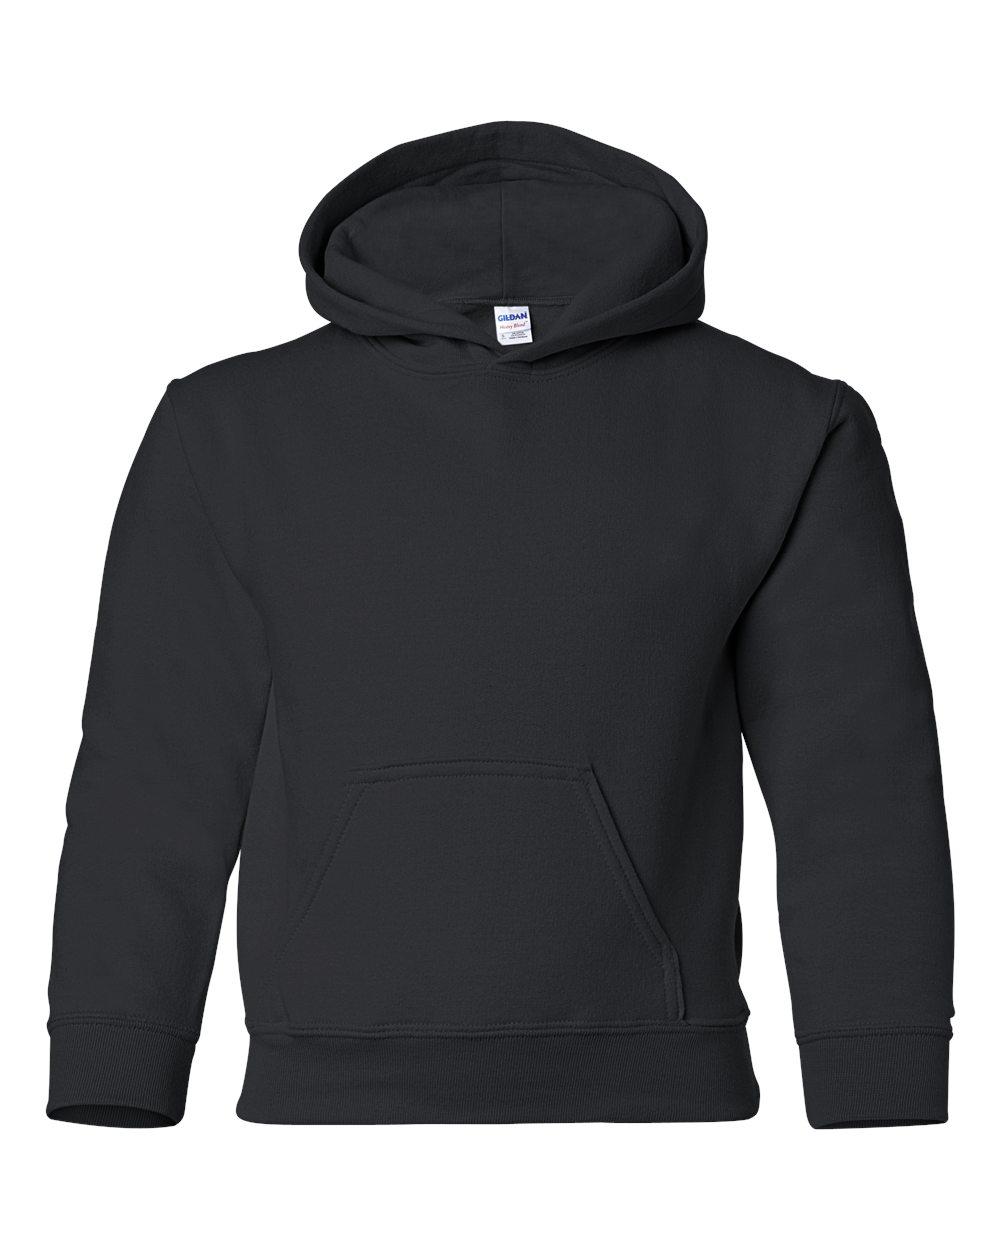 Picture of Gildan Youth Hooded Sweatshirt